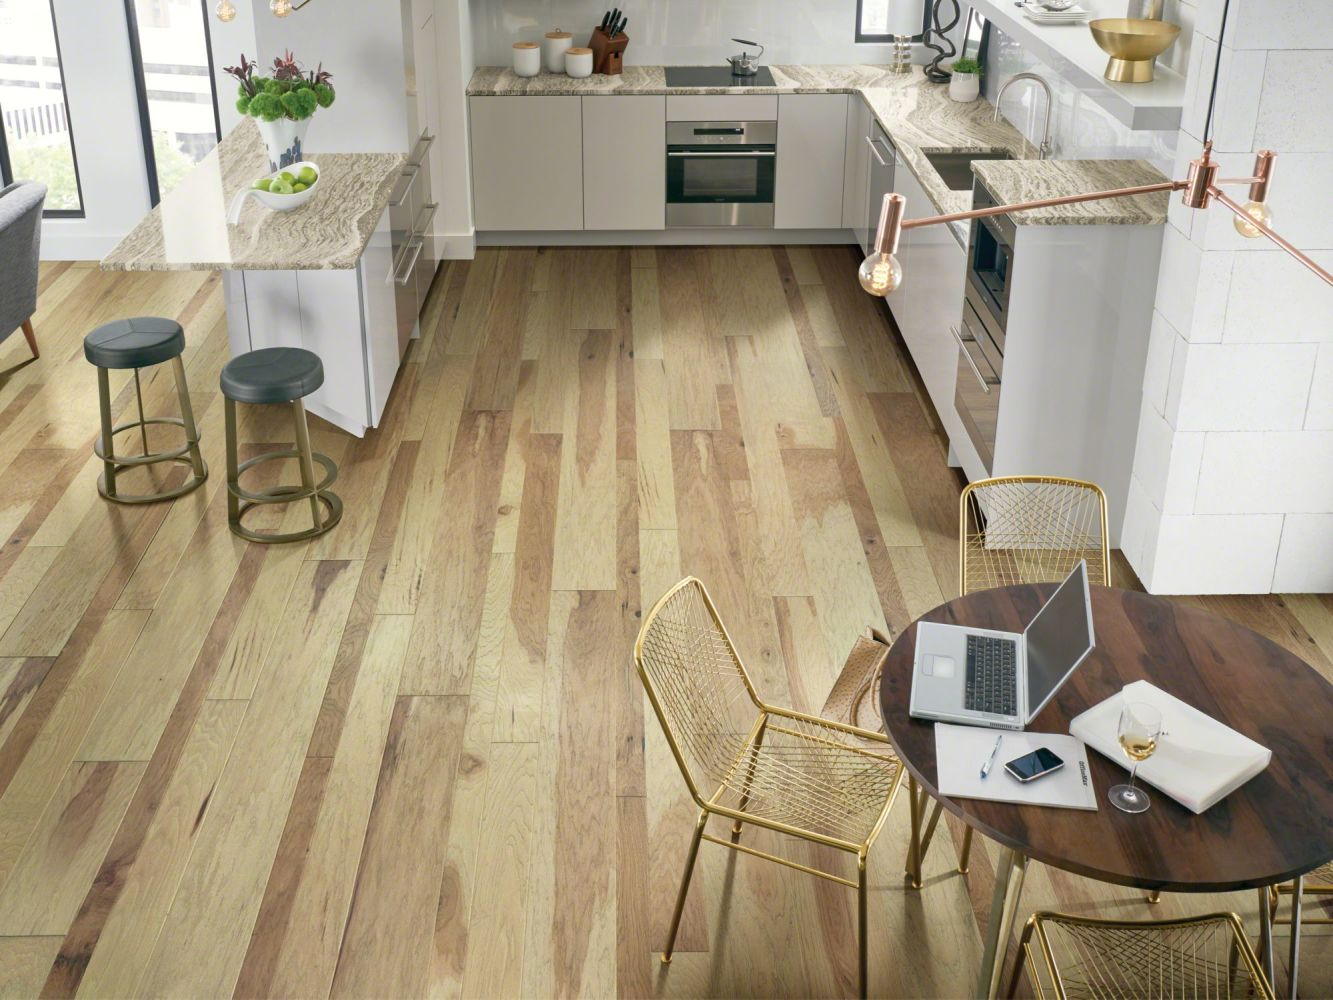 Shaw Floors Repel Hardwood Landmark Mixed Hickory Golden Gate 01059_SW701